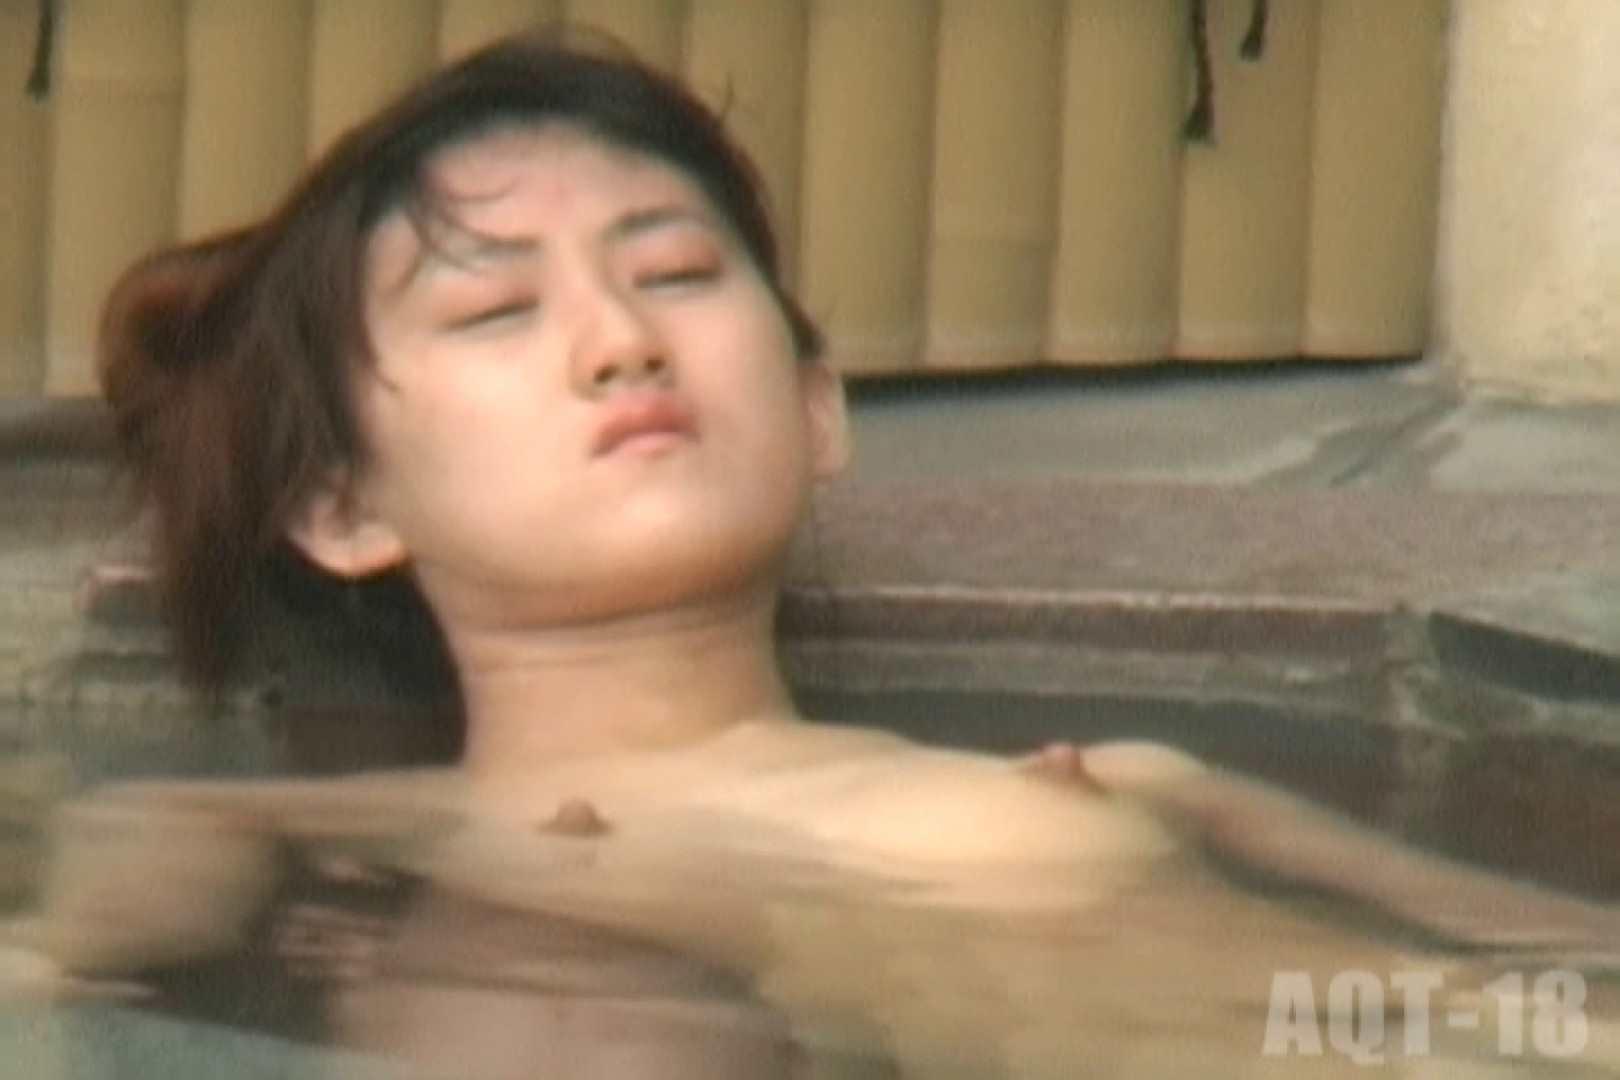 Aquaな露天風呂Vol.862 美しいOLの裸体 戯れ無修正画像 99pic 68